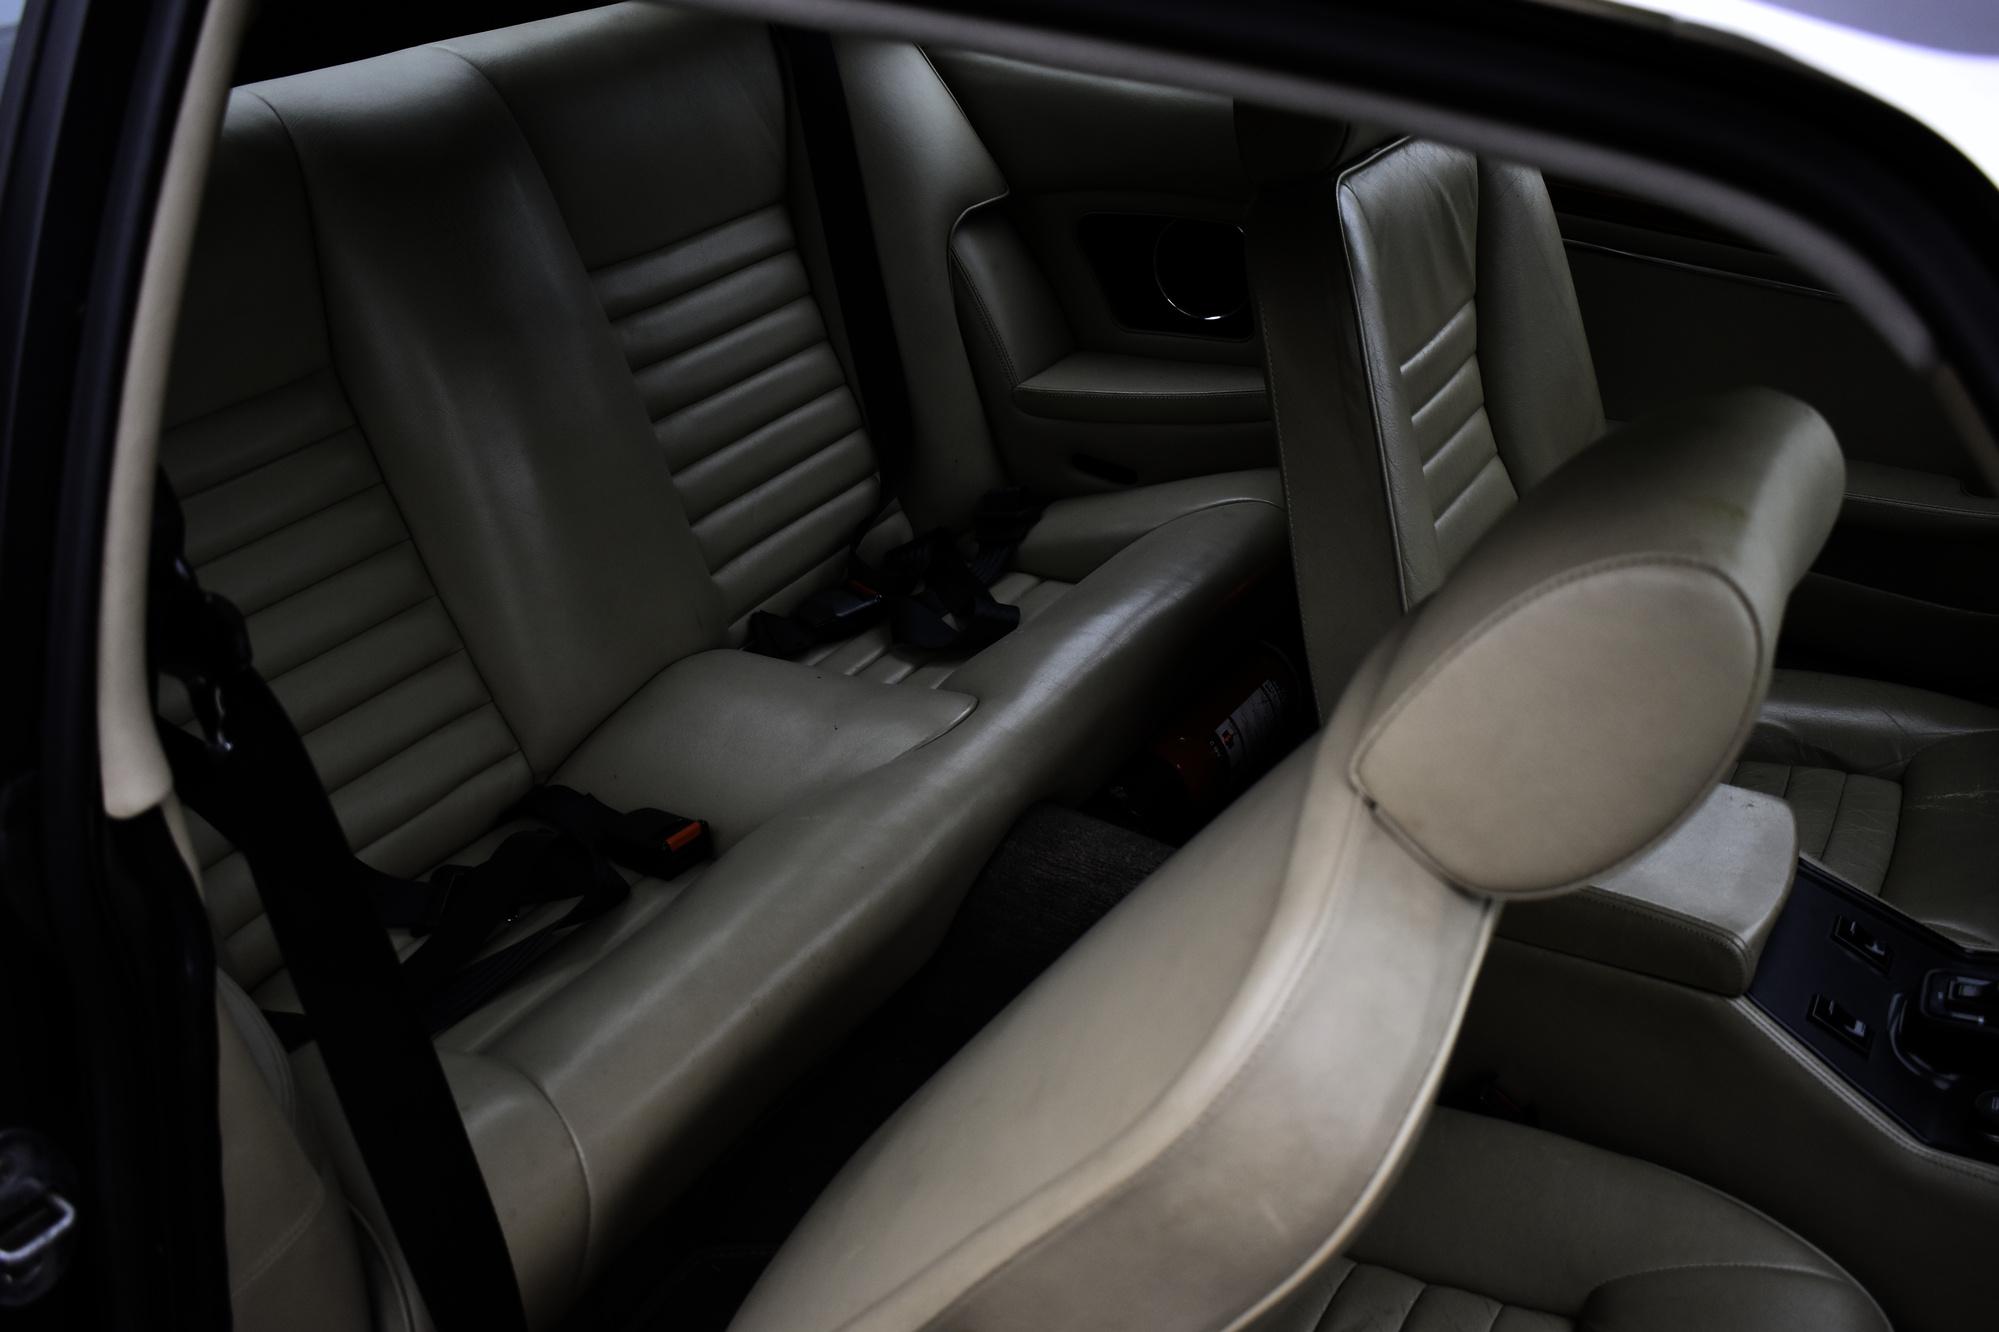 Grauer 1985 Jaguar XJS 5.3 V12 H.E. Coupe Oldtimer Veteranenfahrzeug Rückbank mit nach vorne geklapptem Beifahrersitz